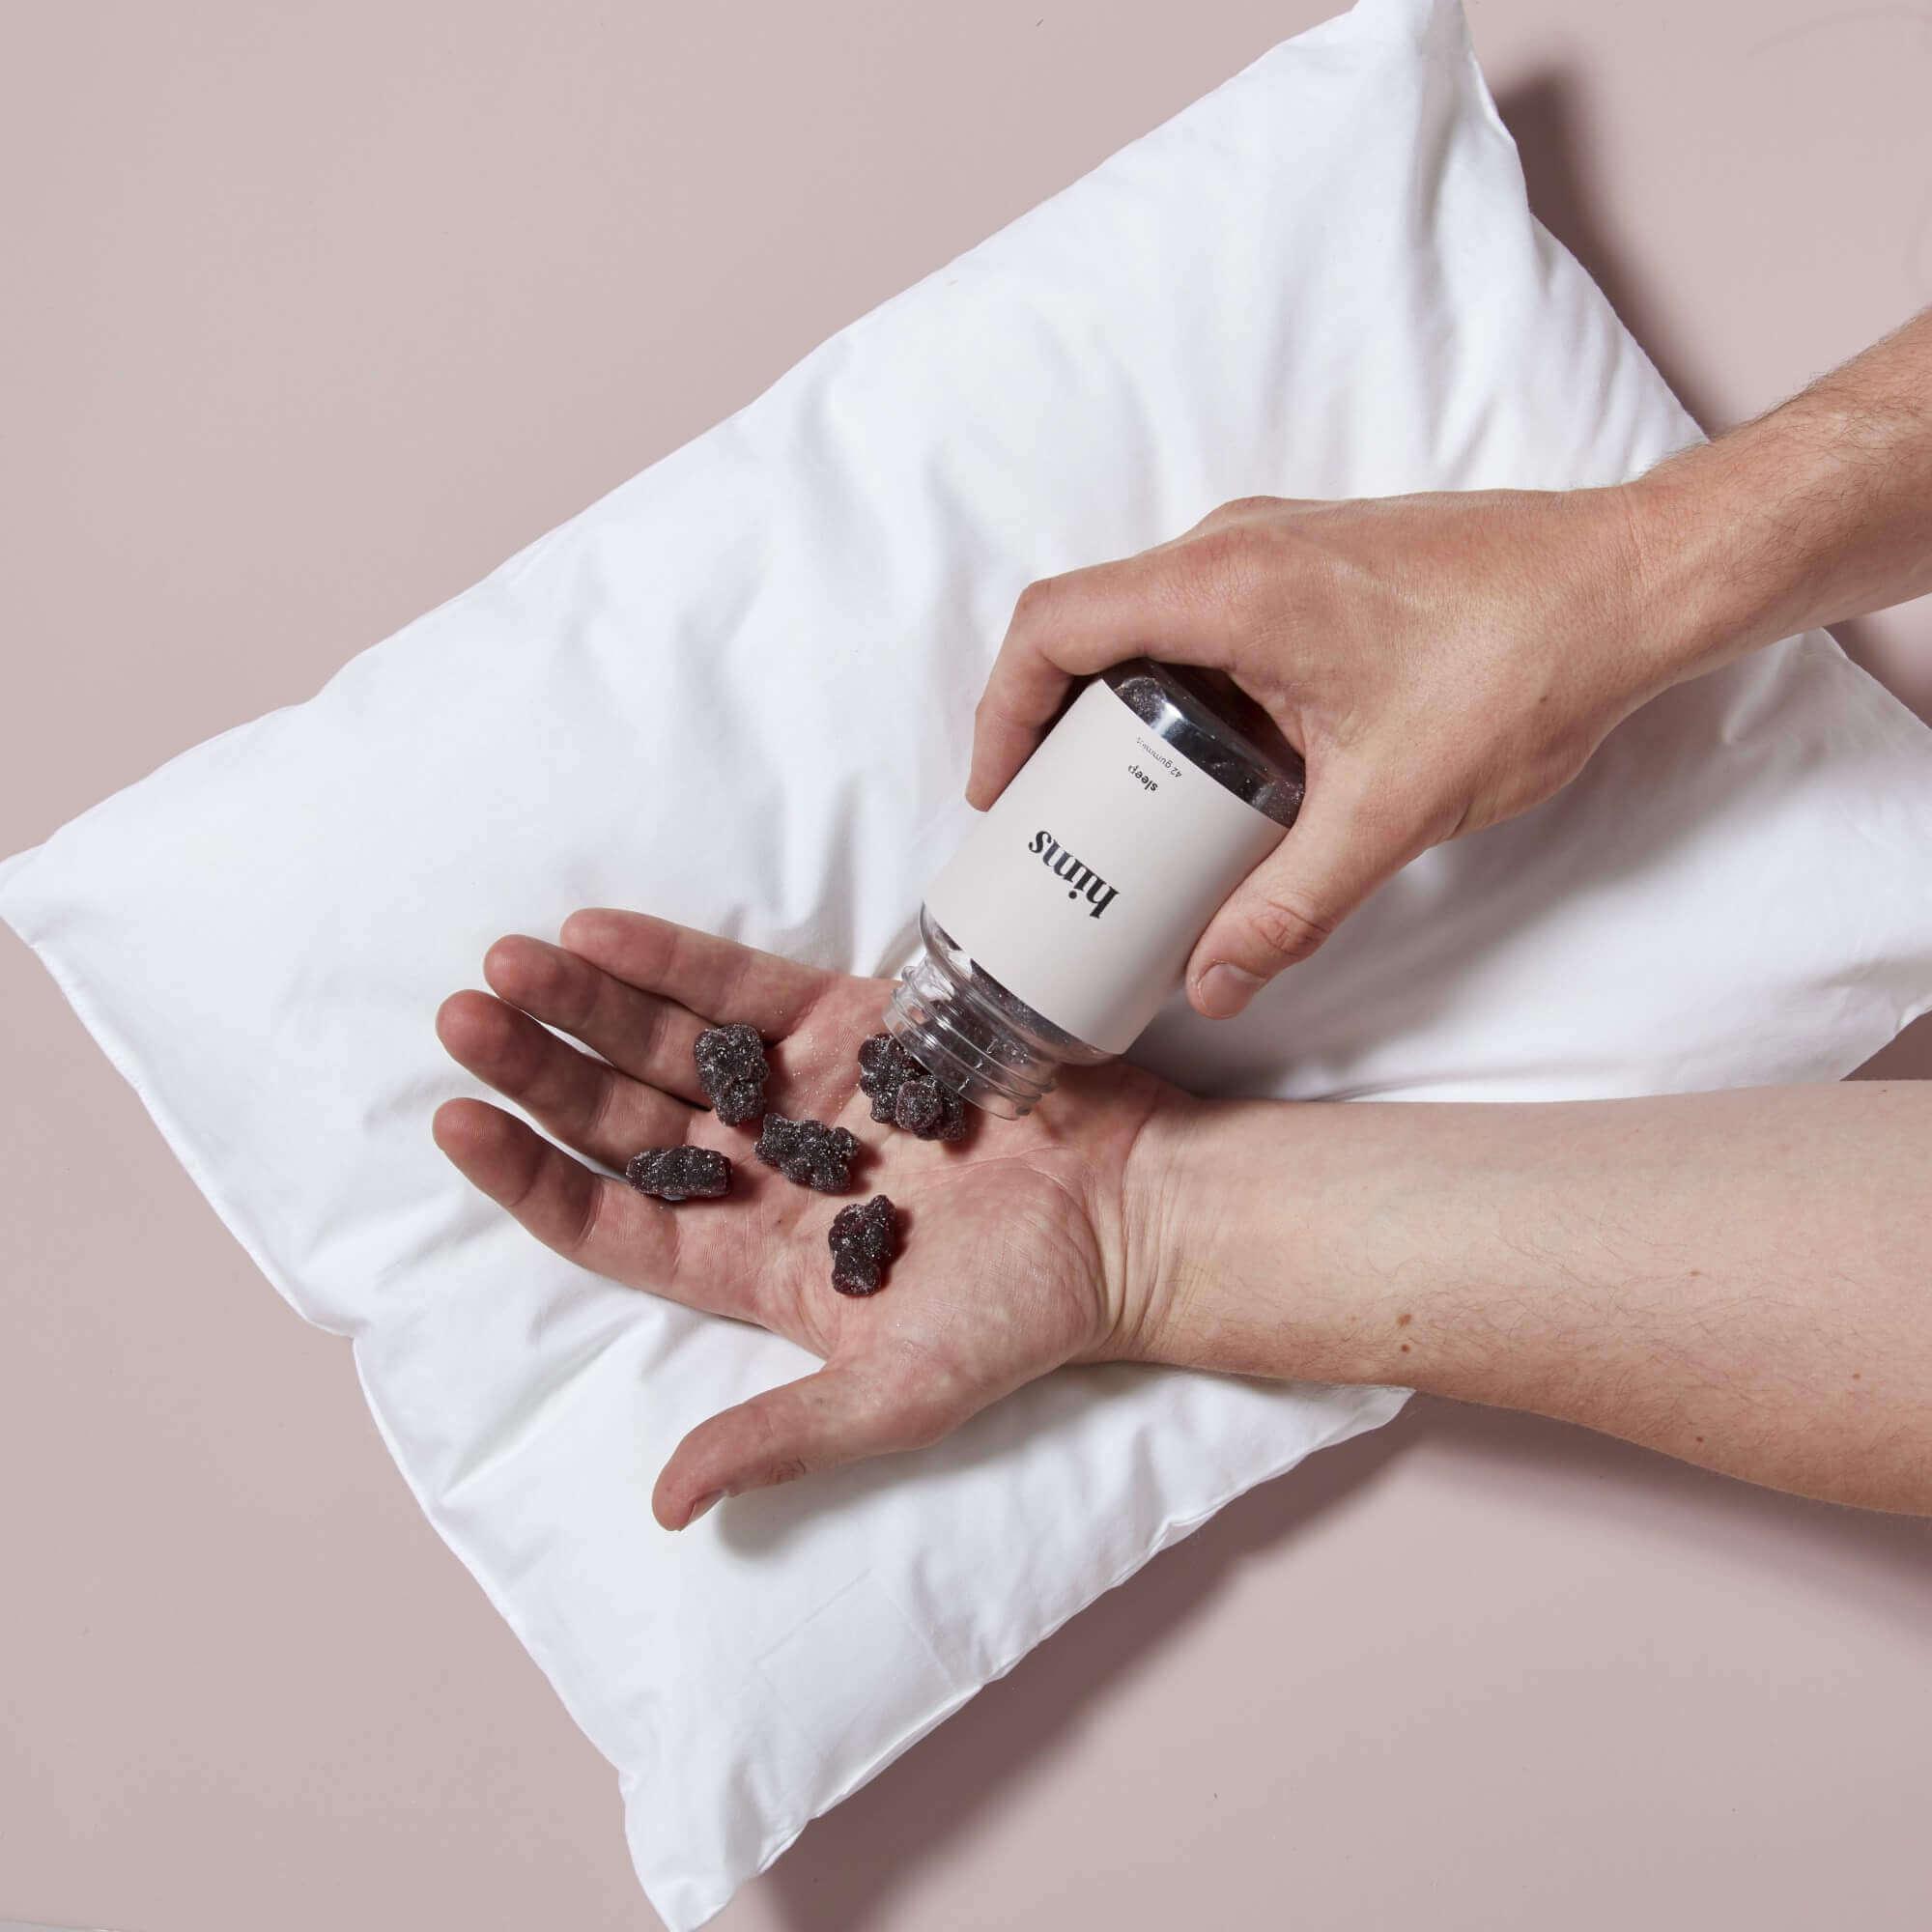 Benefits of Using Chamomile to Improve Sleep